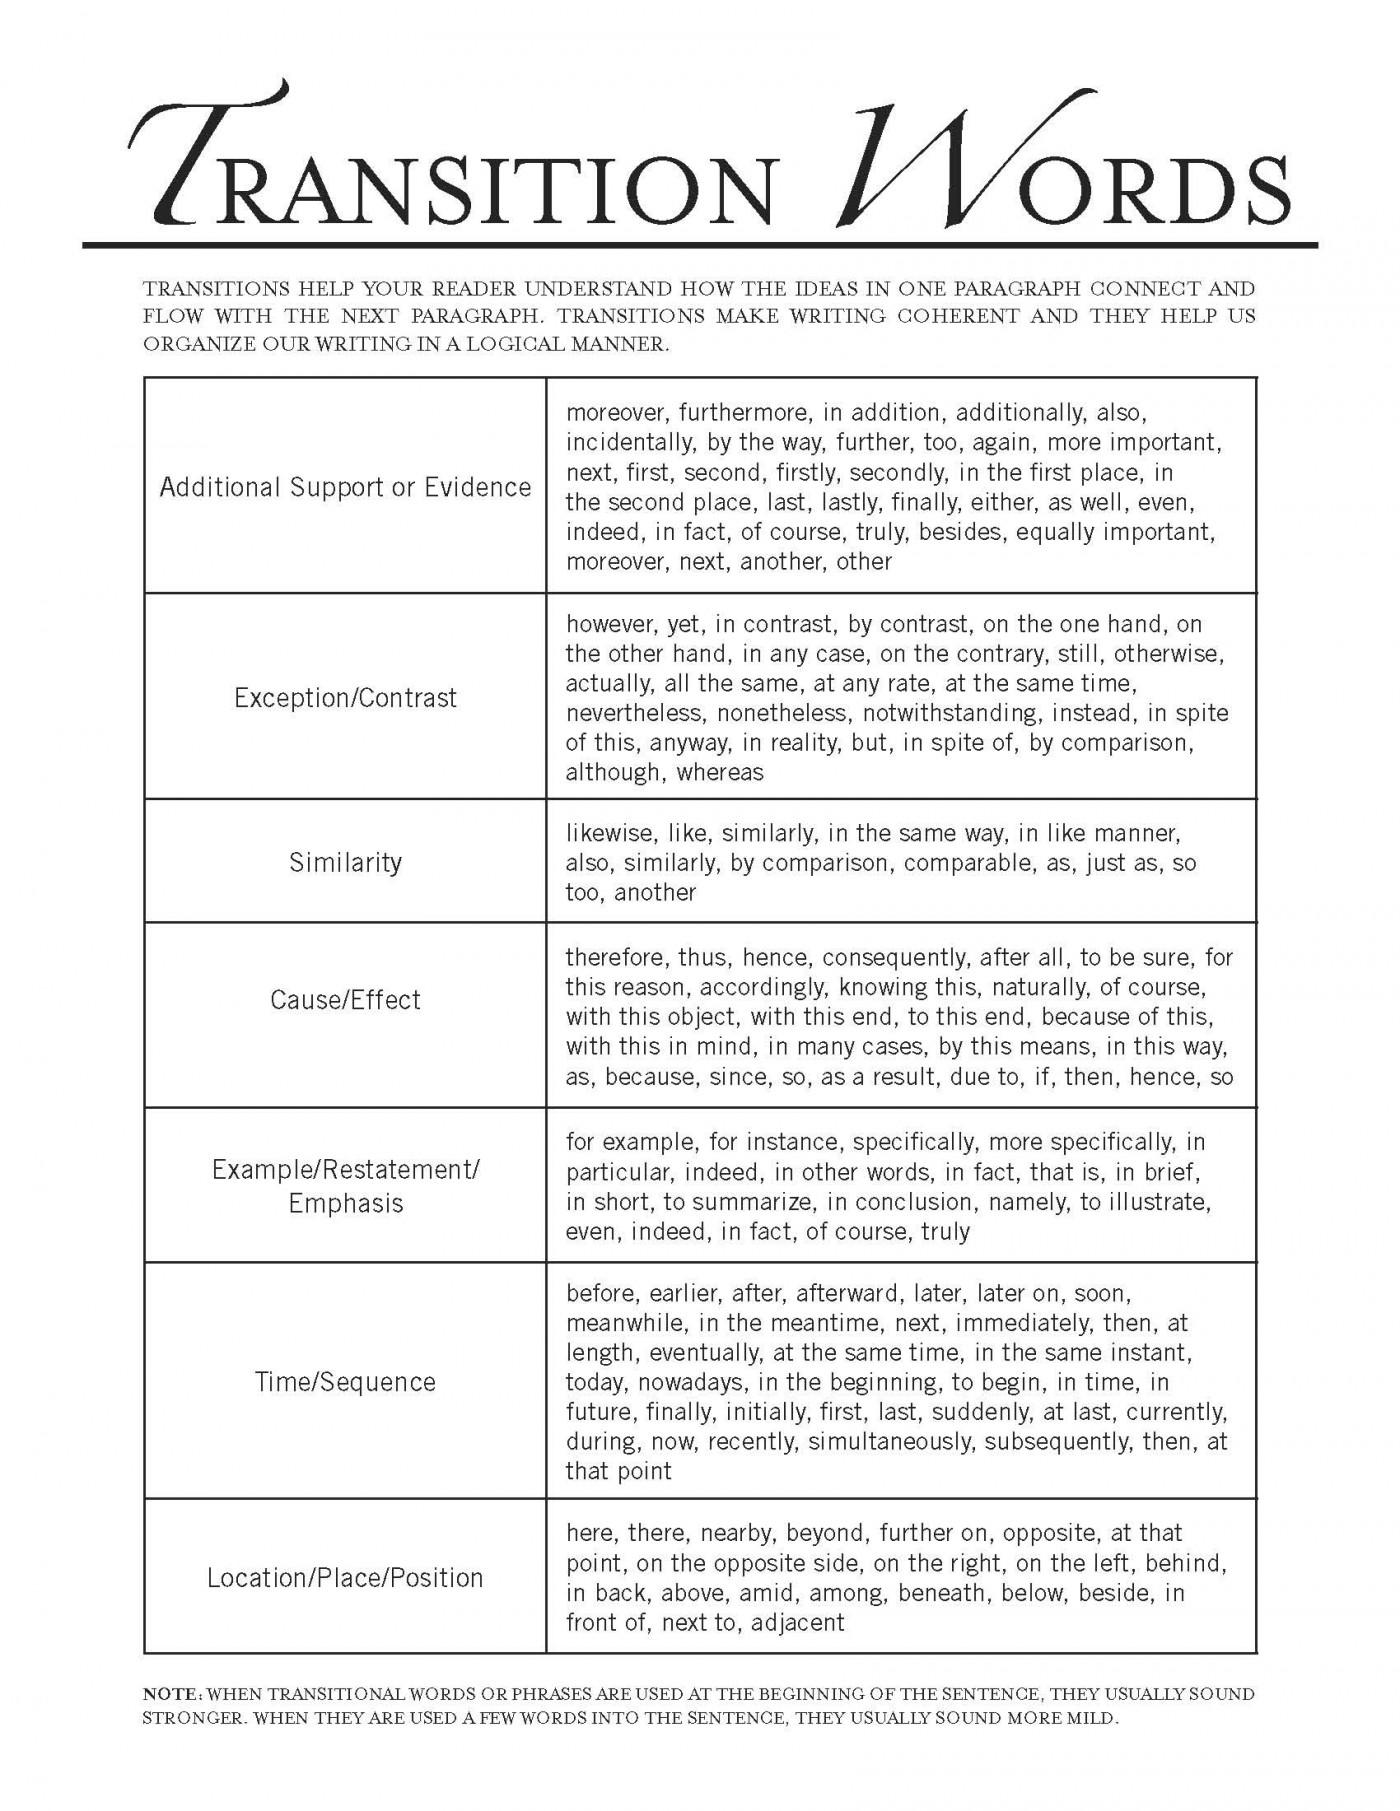 Sas dissertation abstract journal